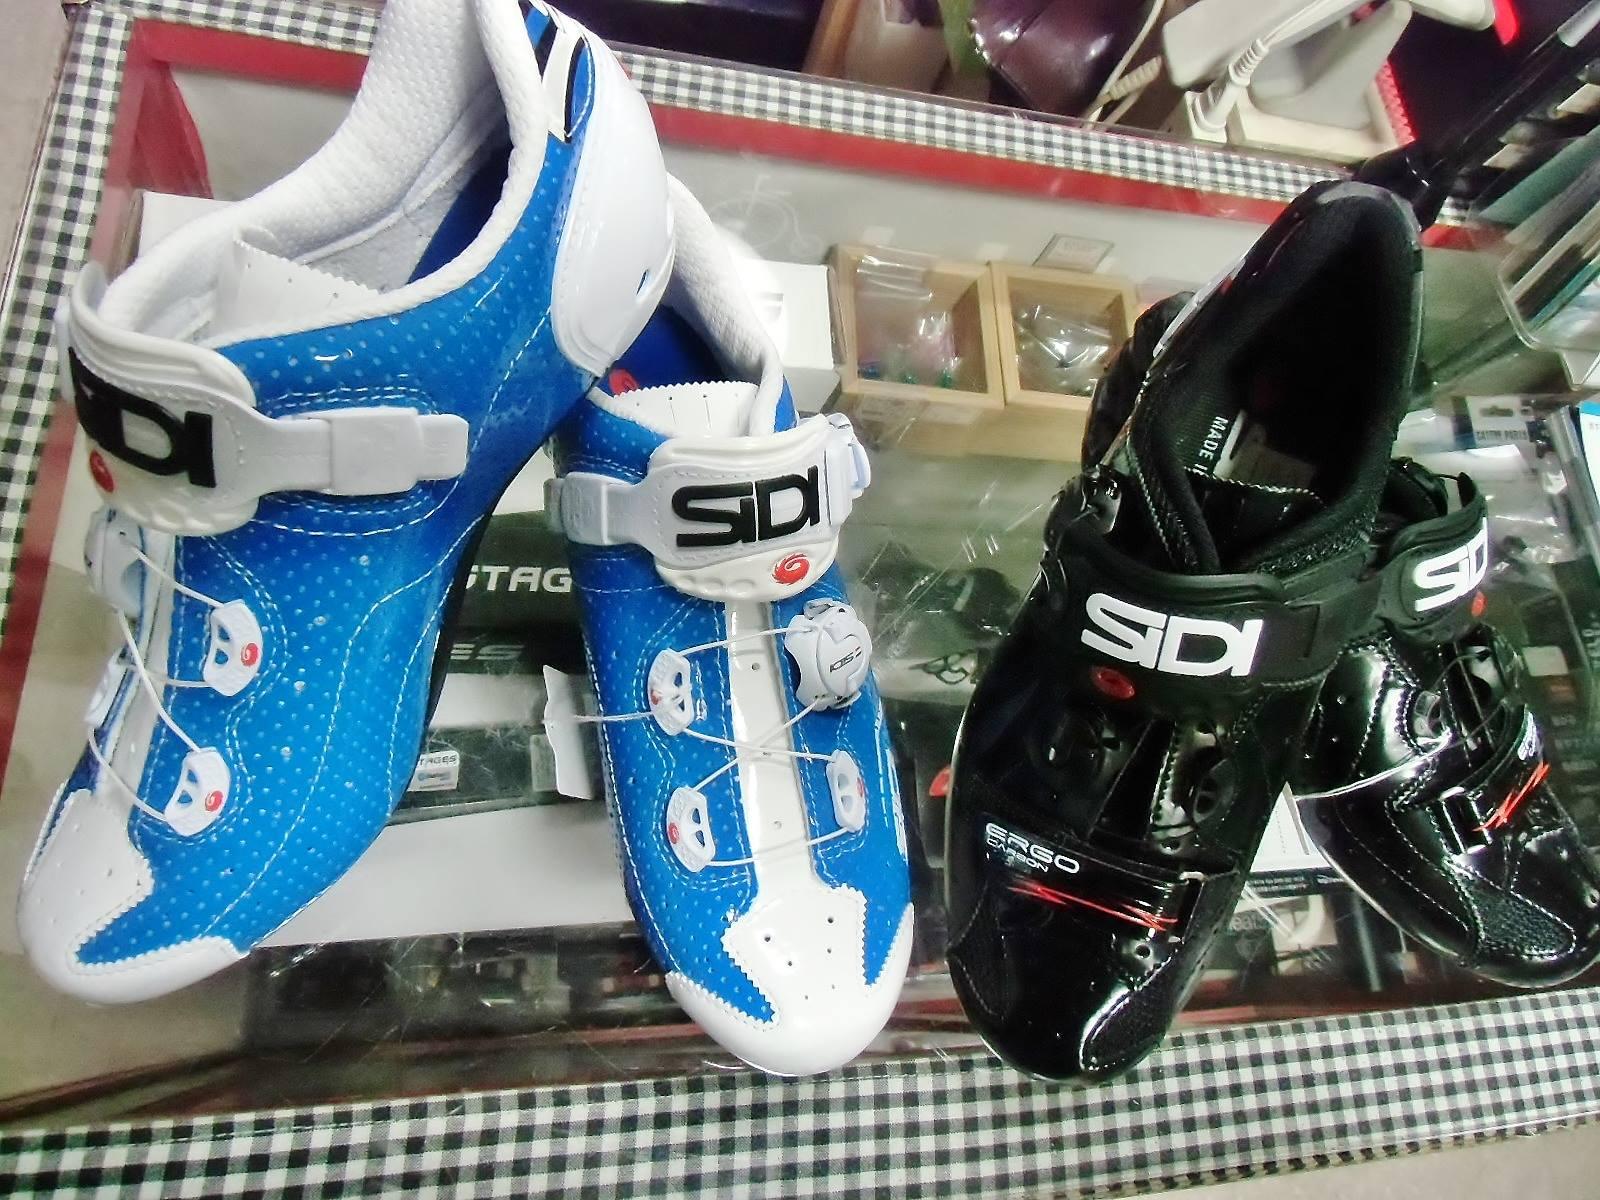 Sidi☆newモデル第2弾入荷!! Bicycleshop Fine 自転車販売 福山市 ロードバイク